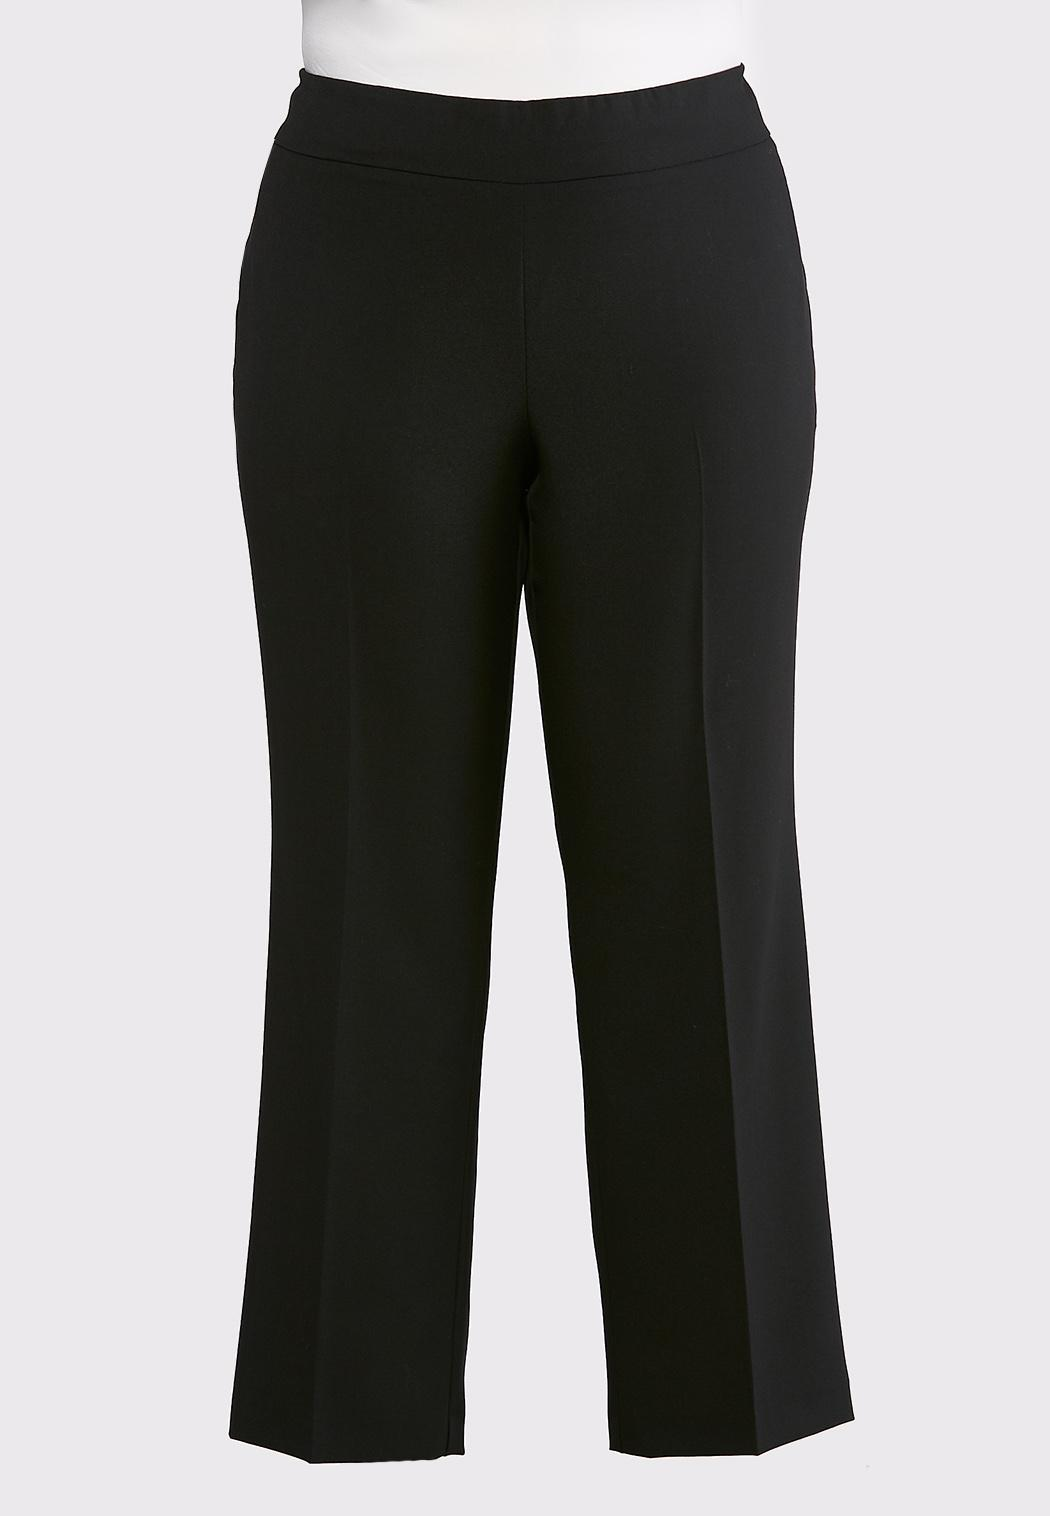 Womens Plus Size Pants Tendencies Navy Chinos Short 30